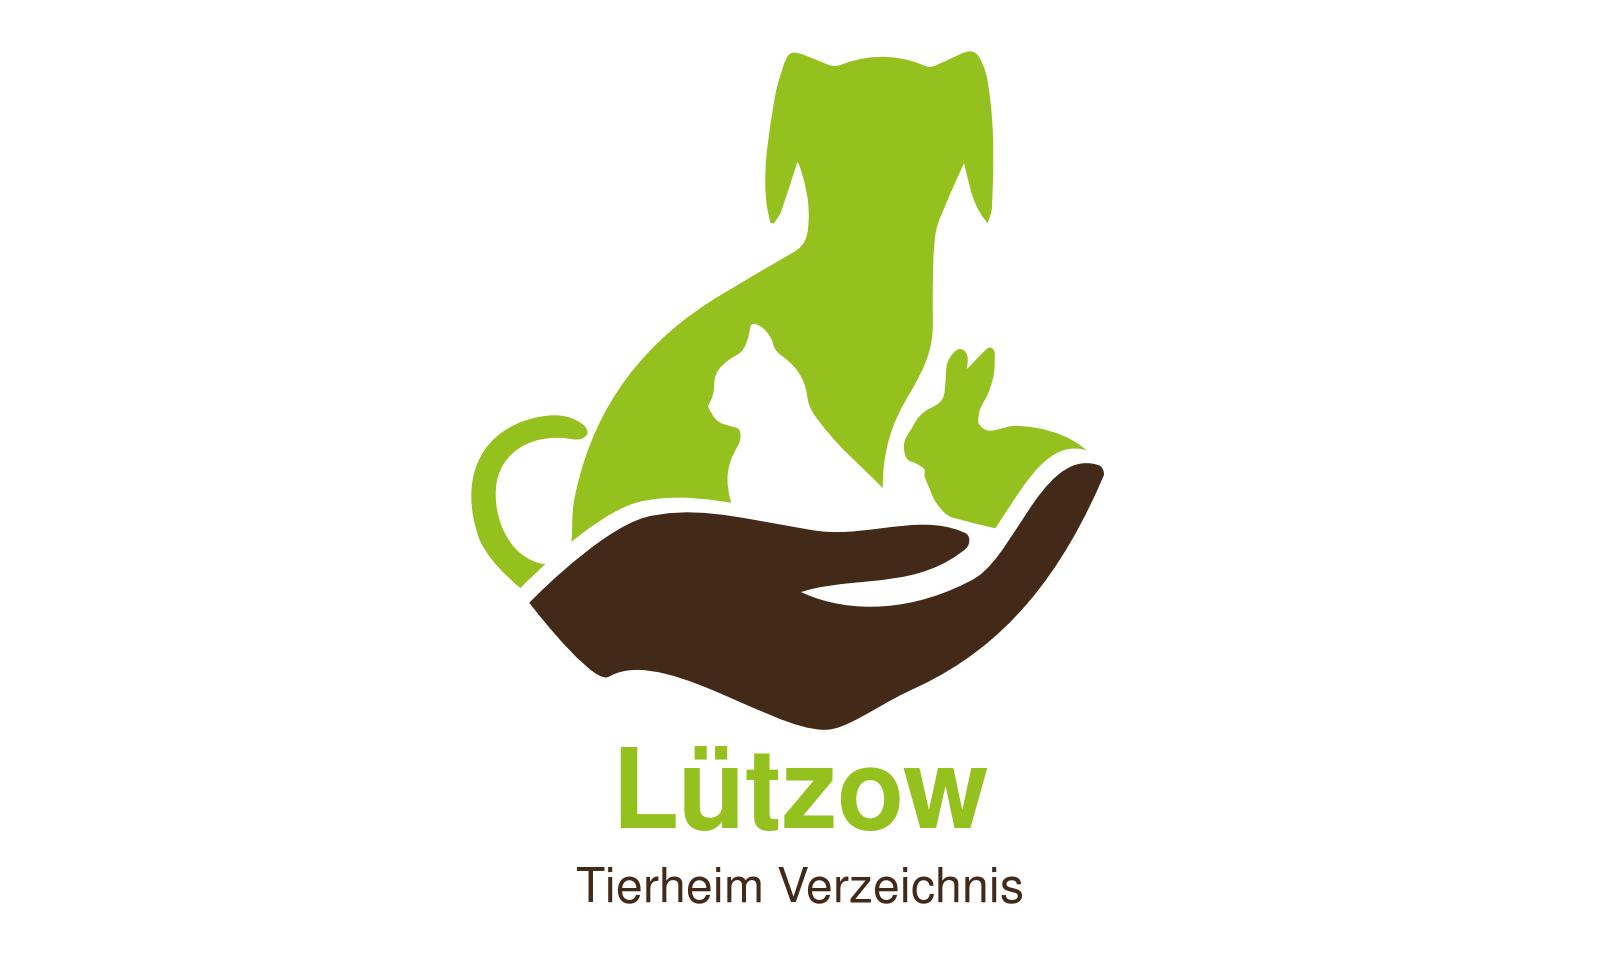 Tierheim Lützow